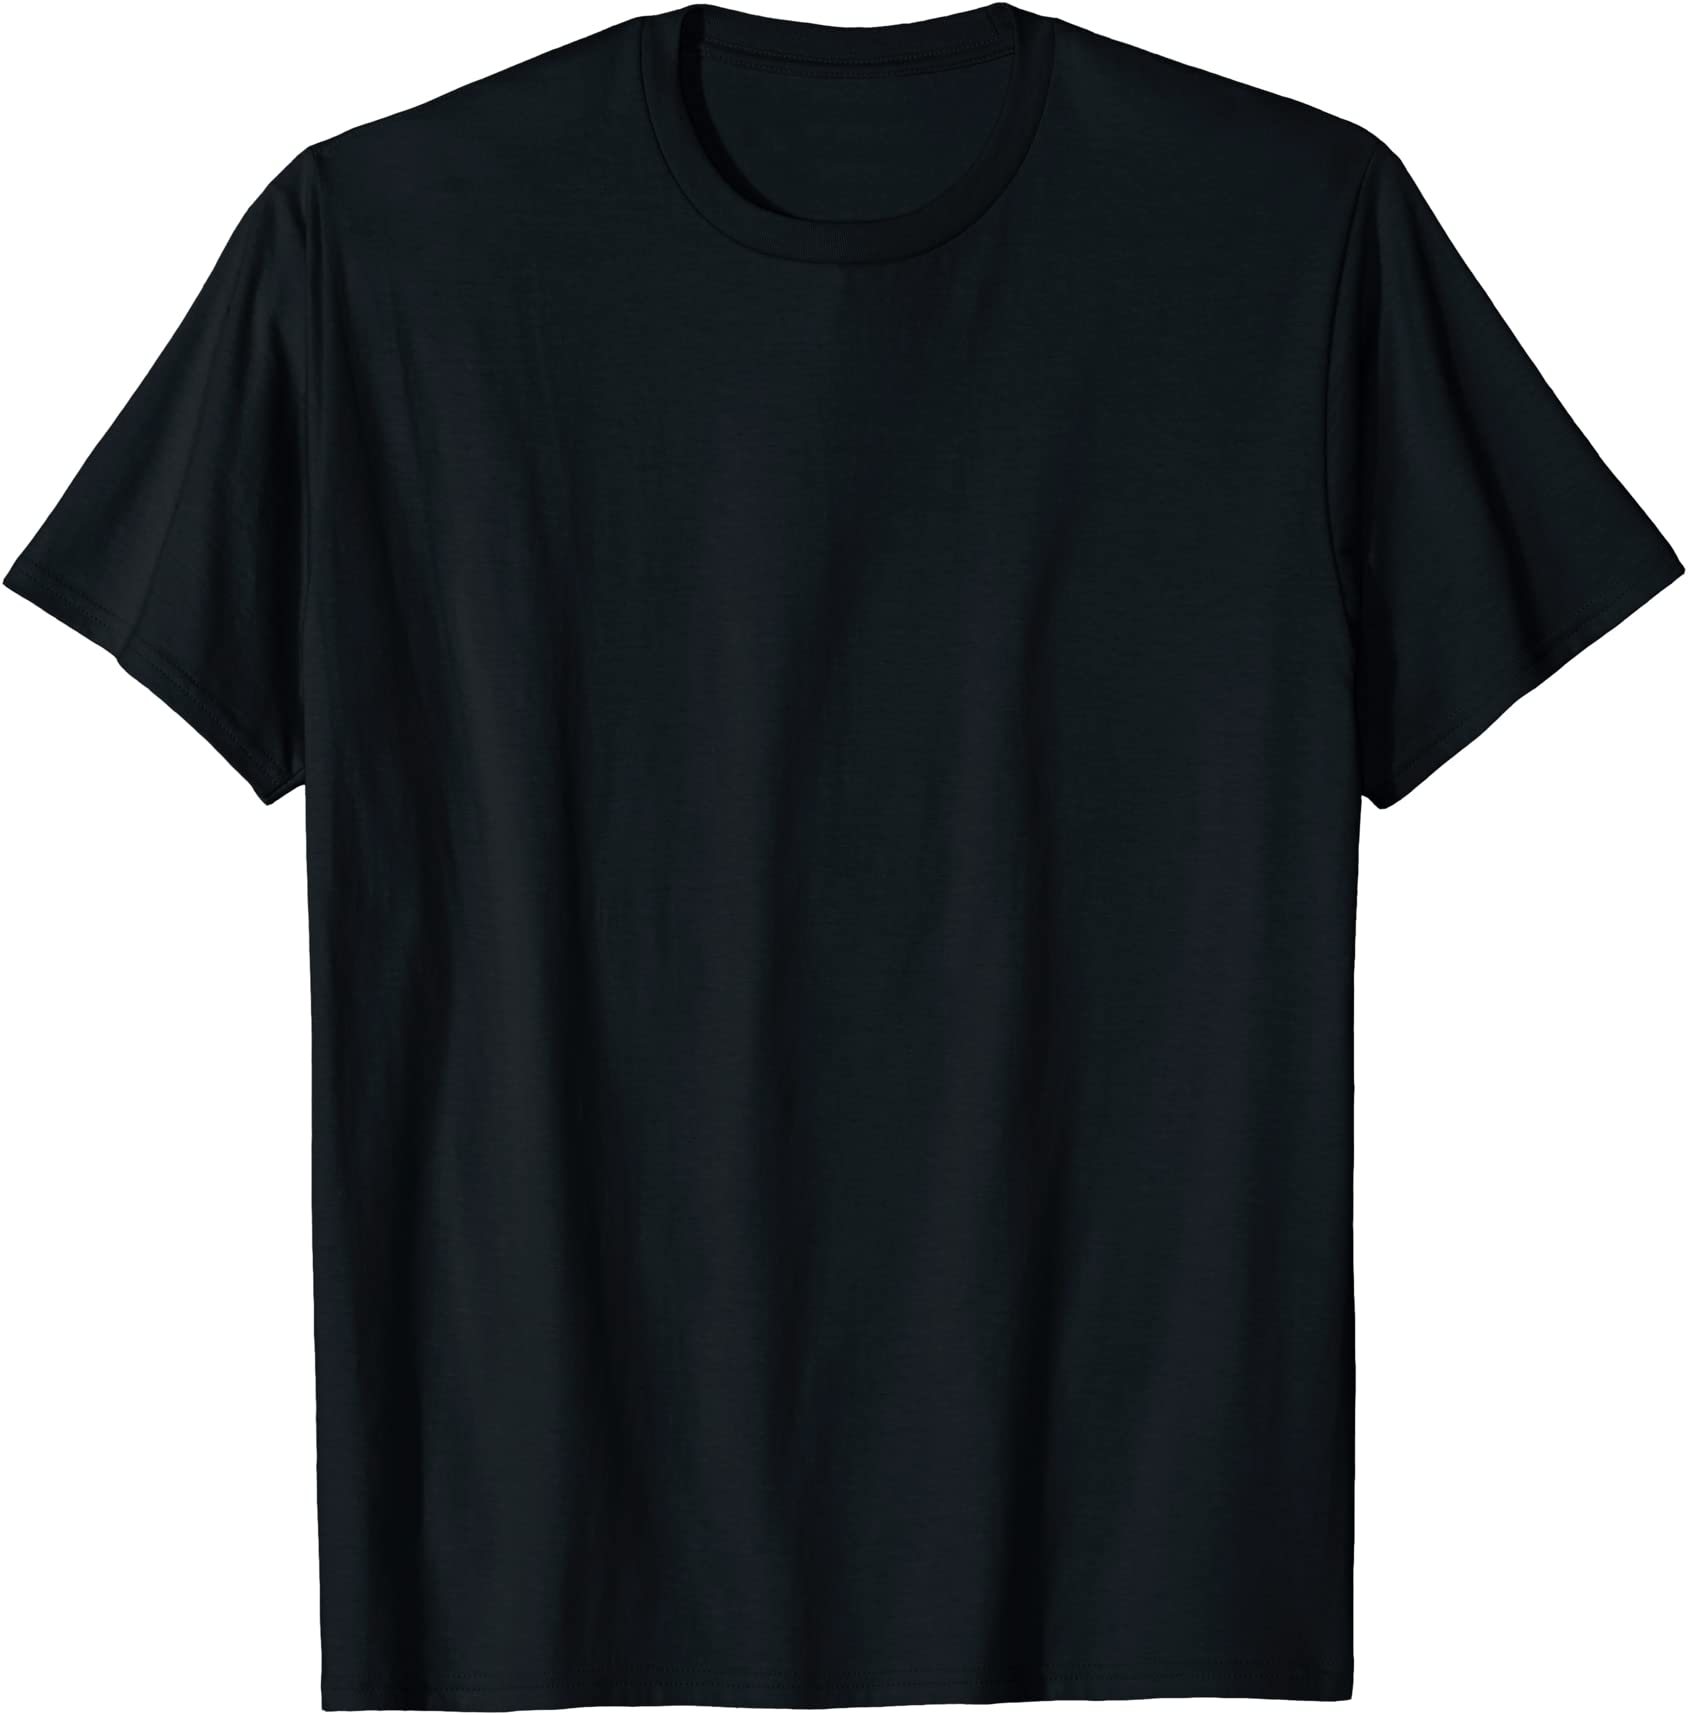 Karate It/'s in my DNA Boys Girls Kids Childrens T-Shirt